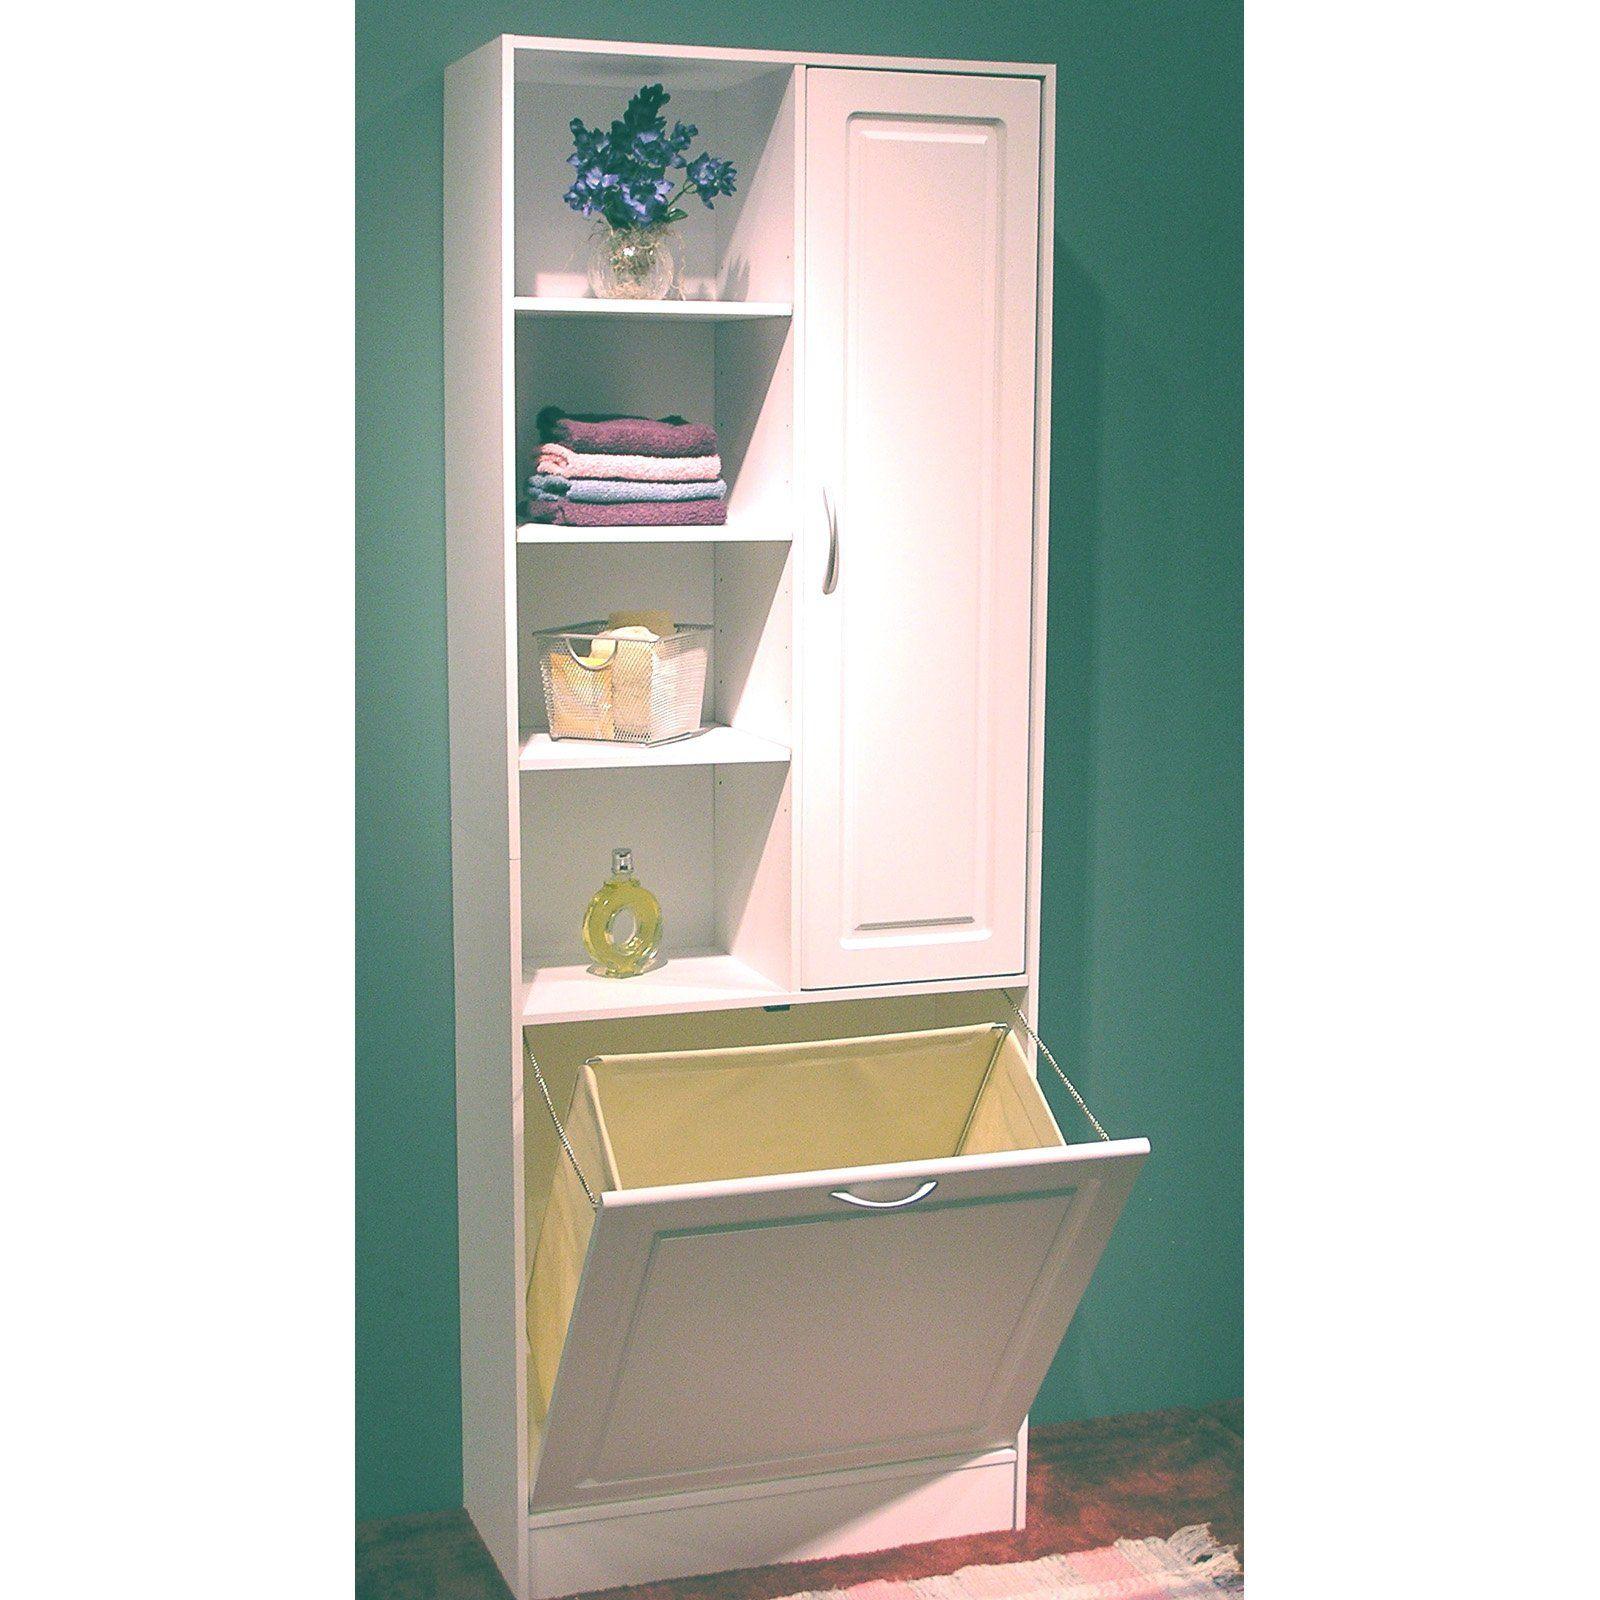 10+ exquisite linen storage ideas for your home decor   hamper